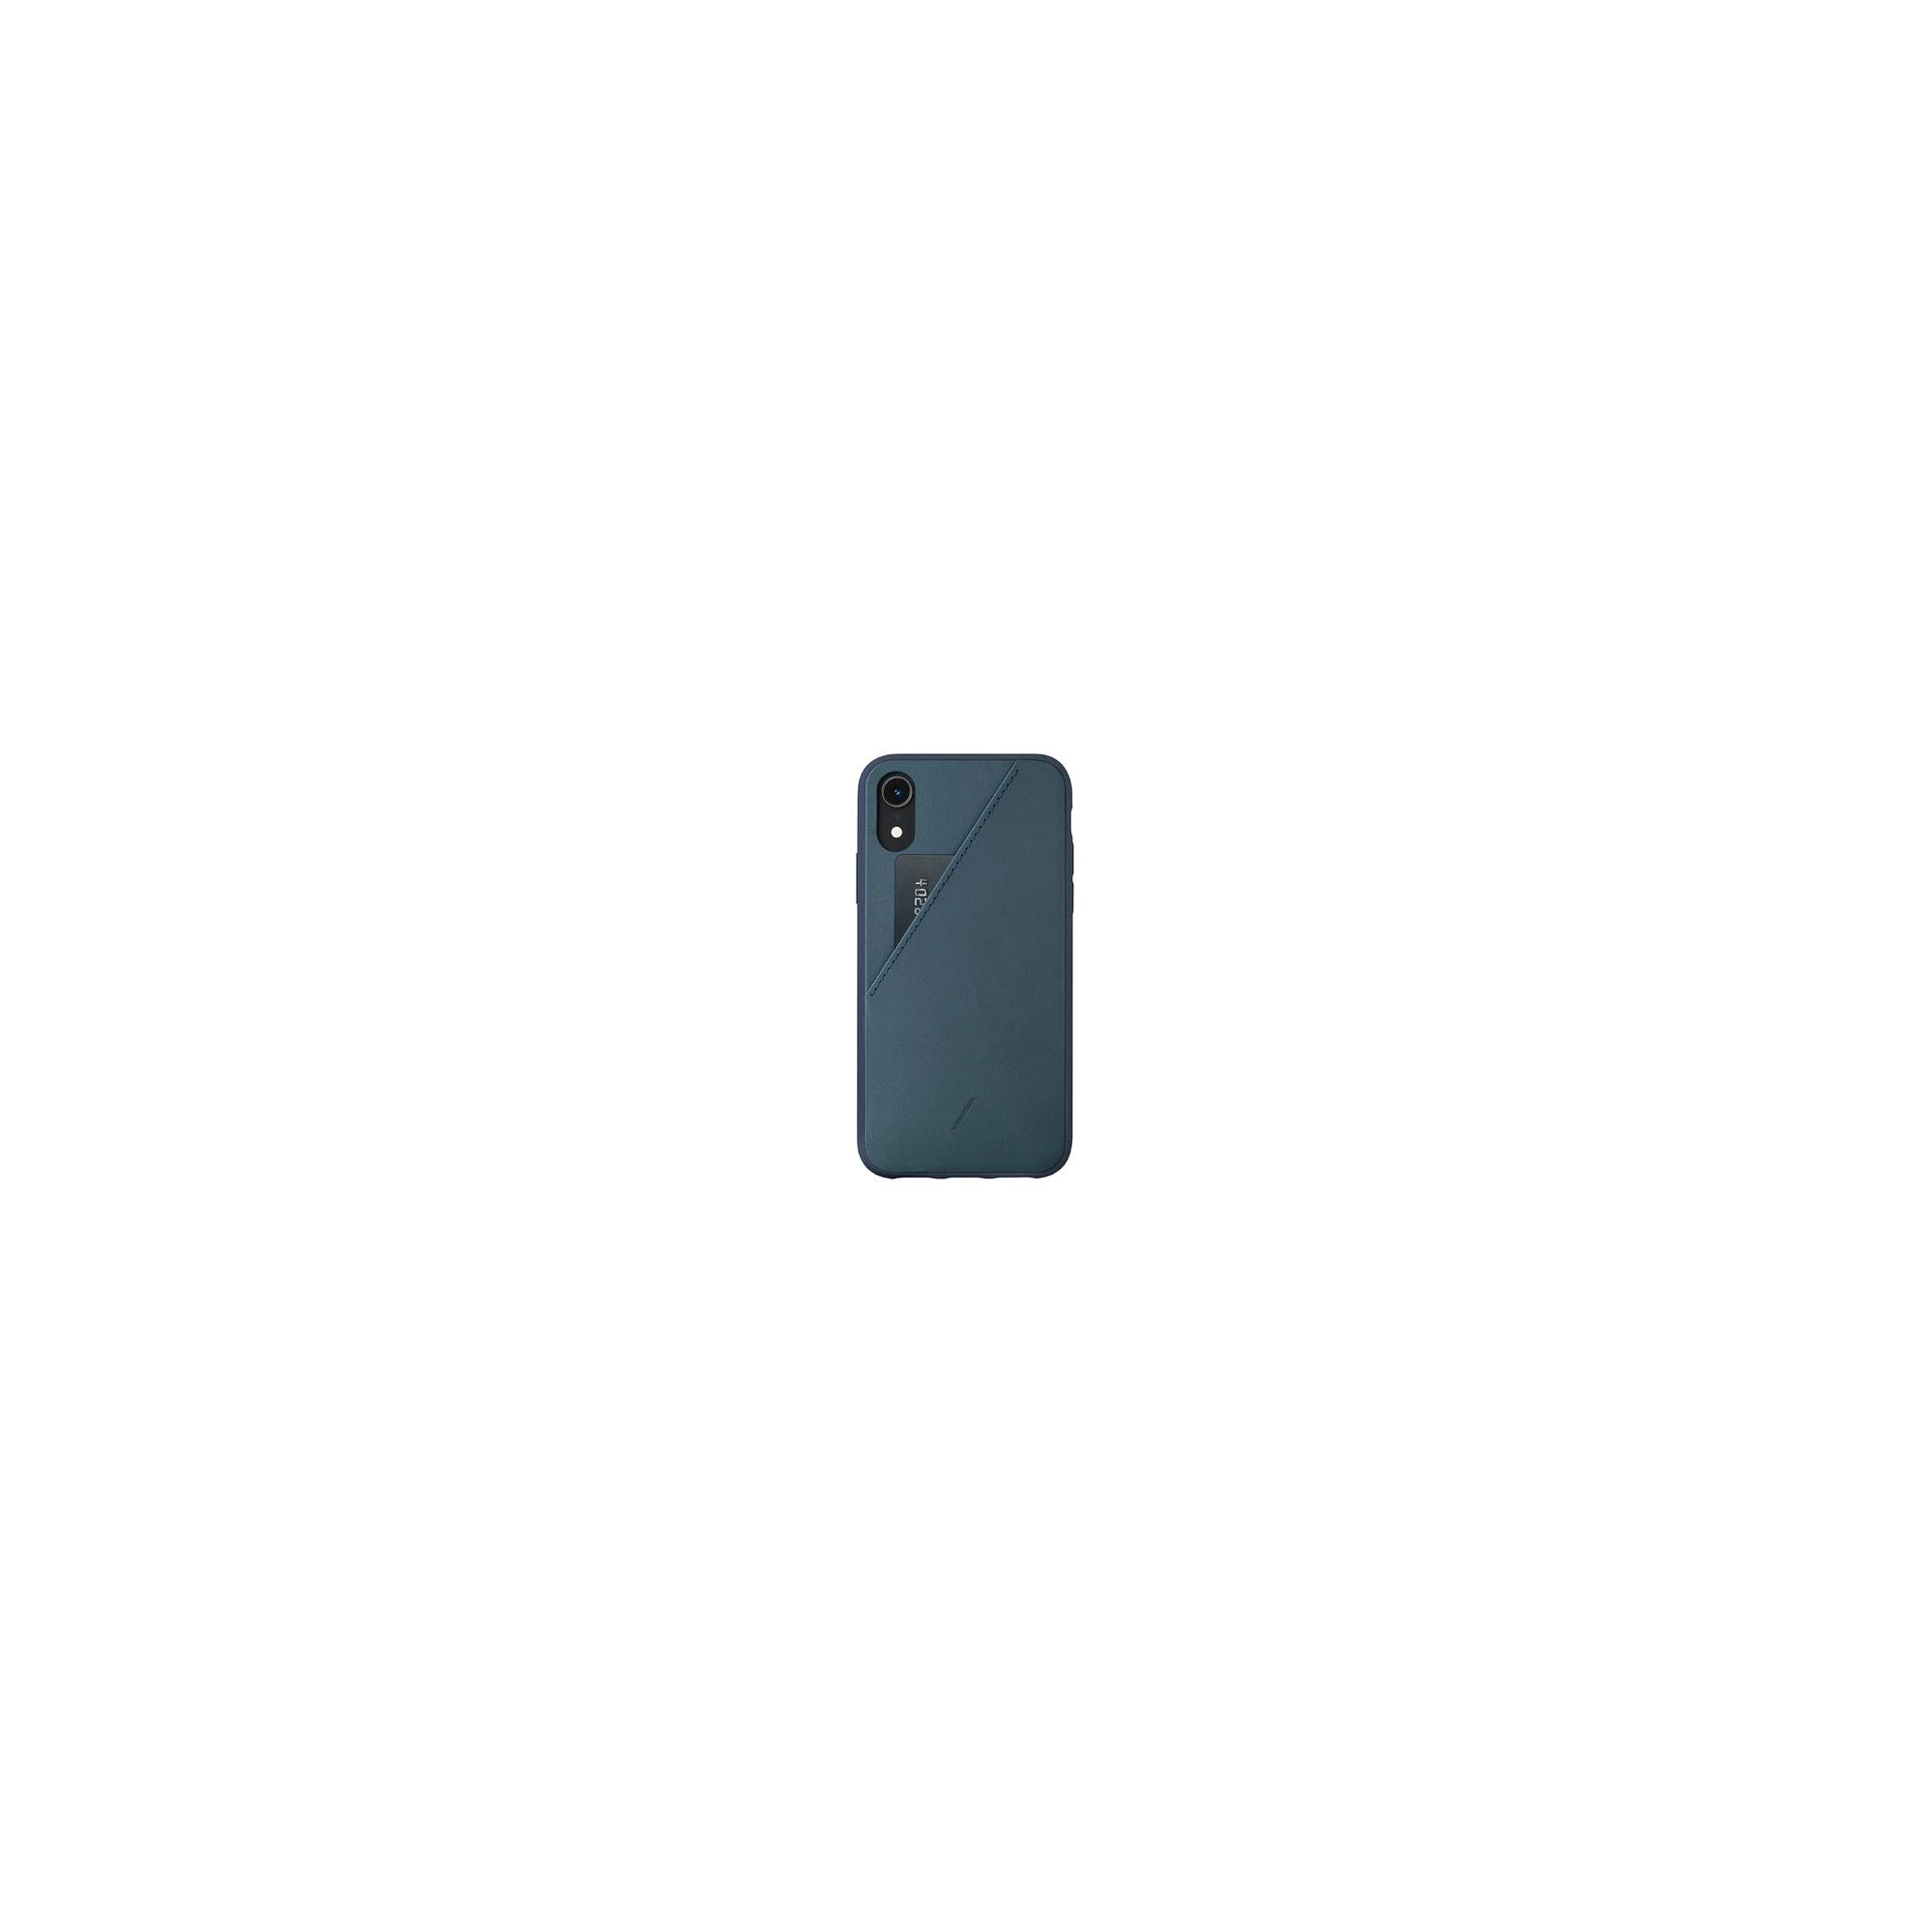 Clic Iphone XR - Navy